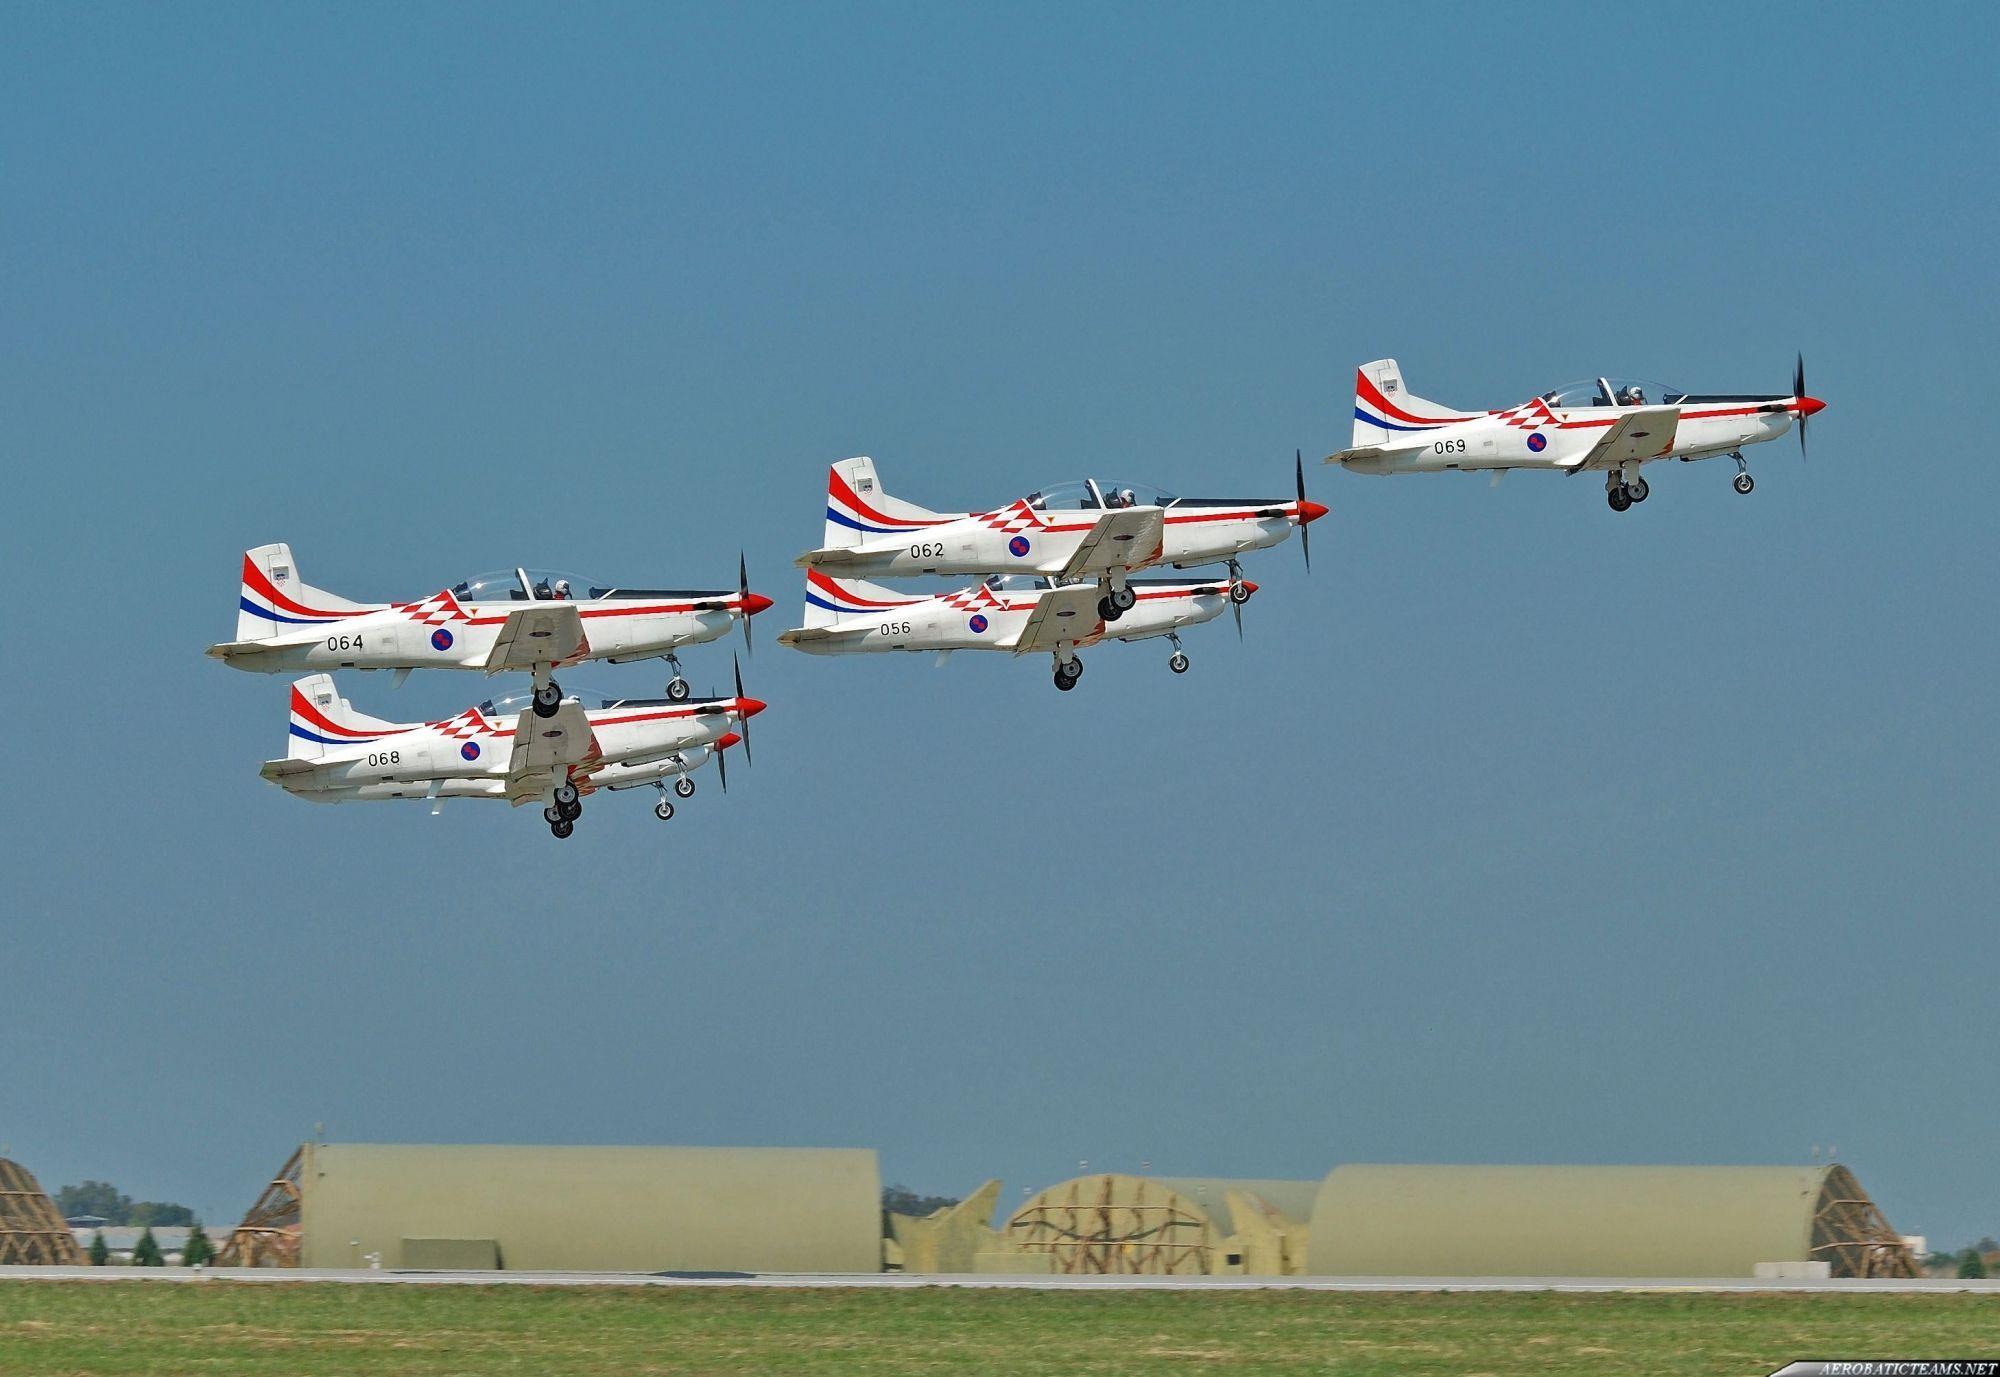 The Croatian Air Force aerobatic display team performed